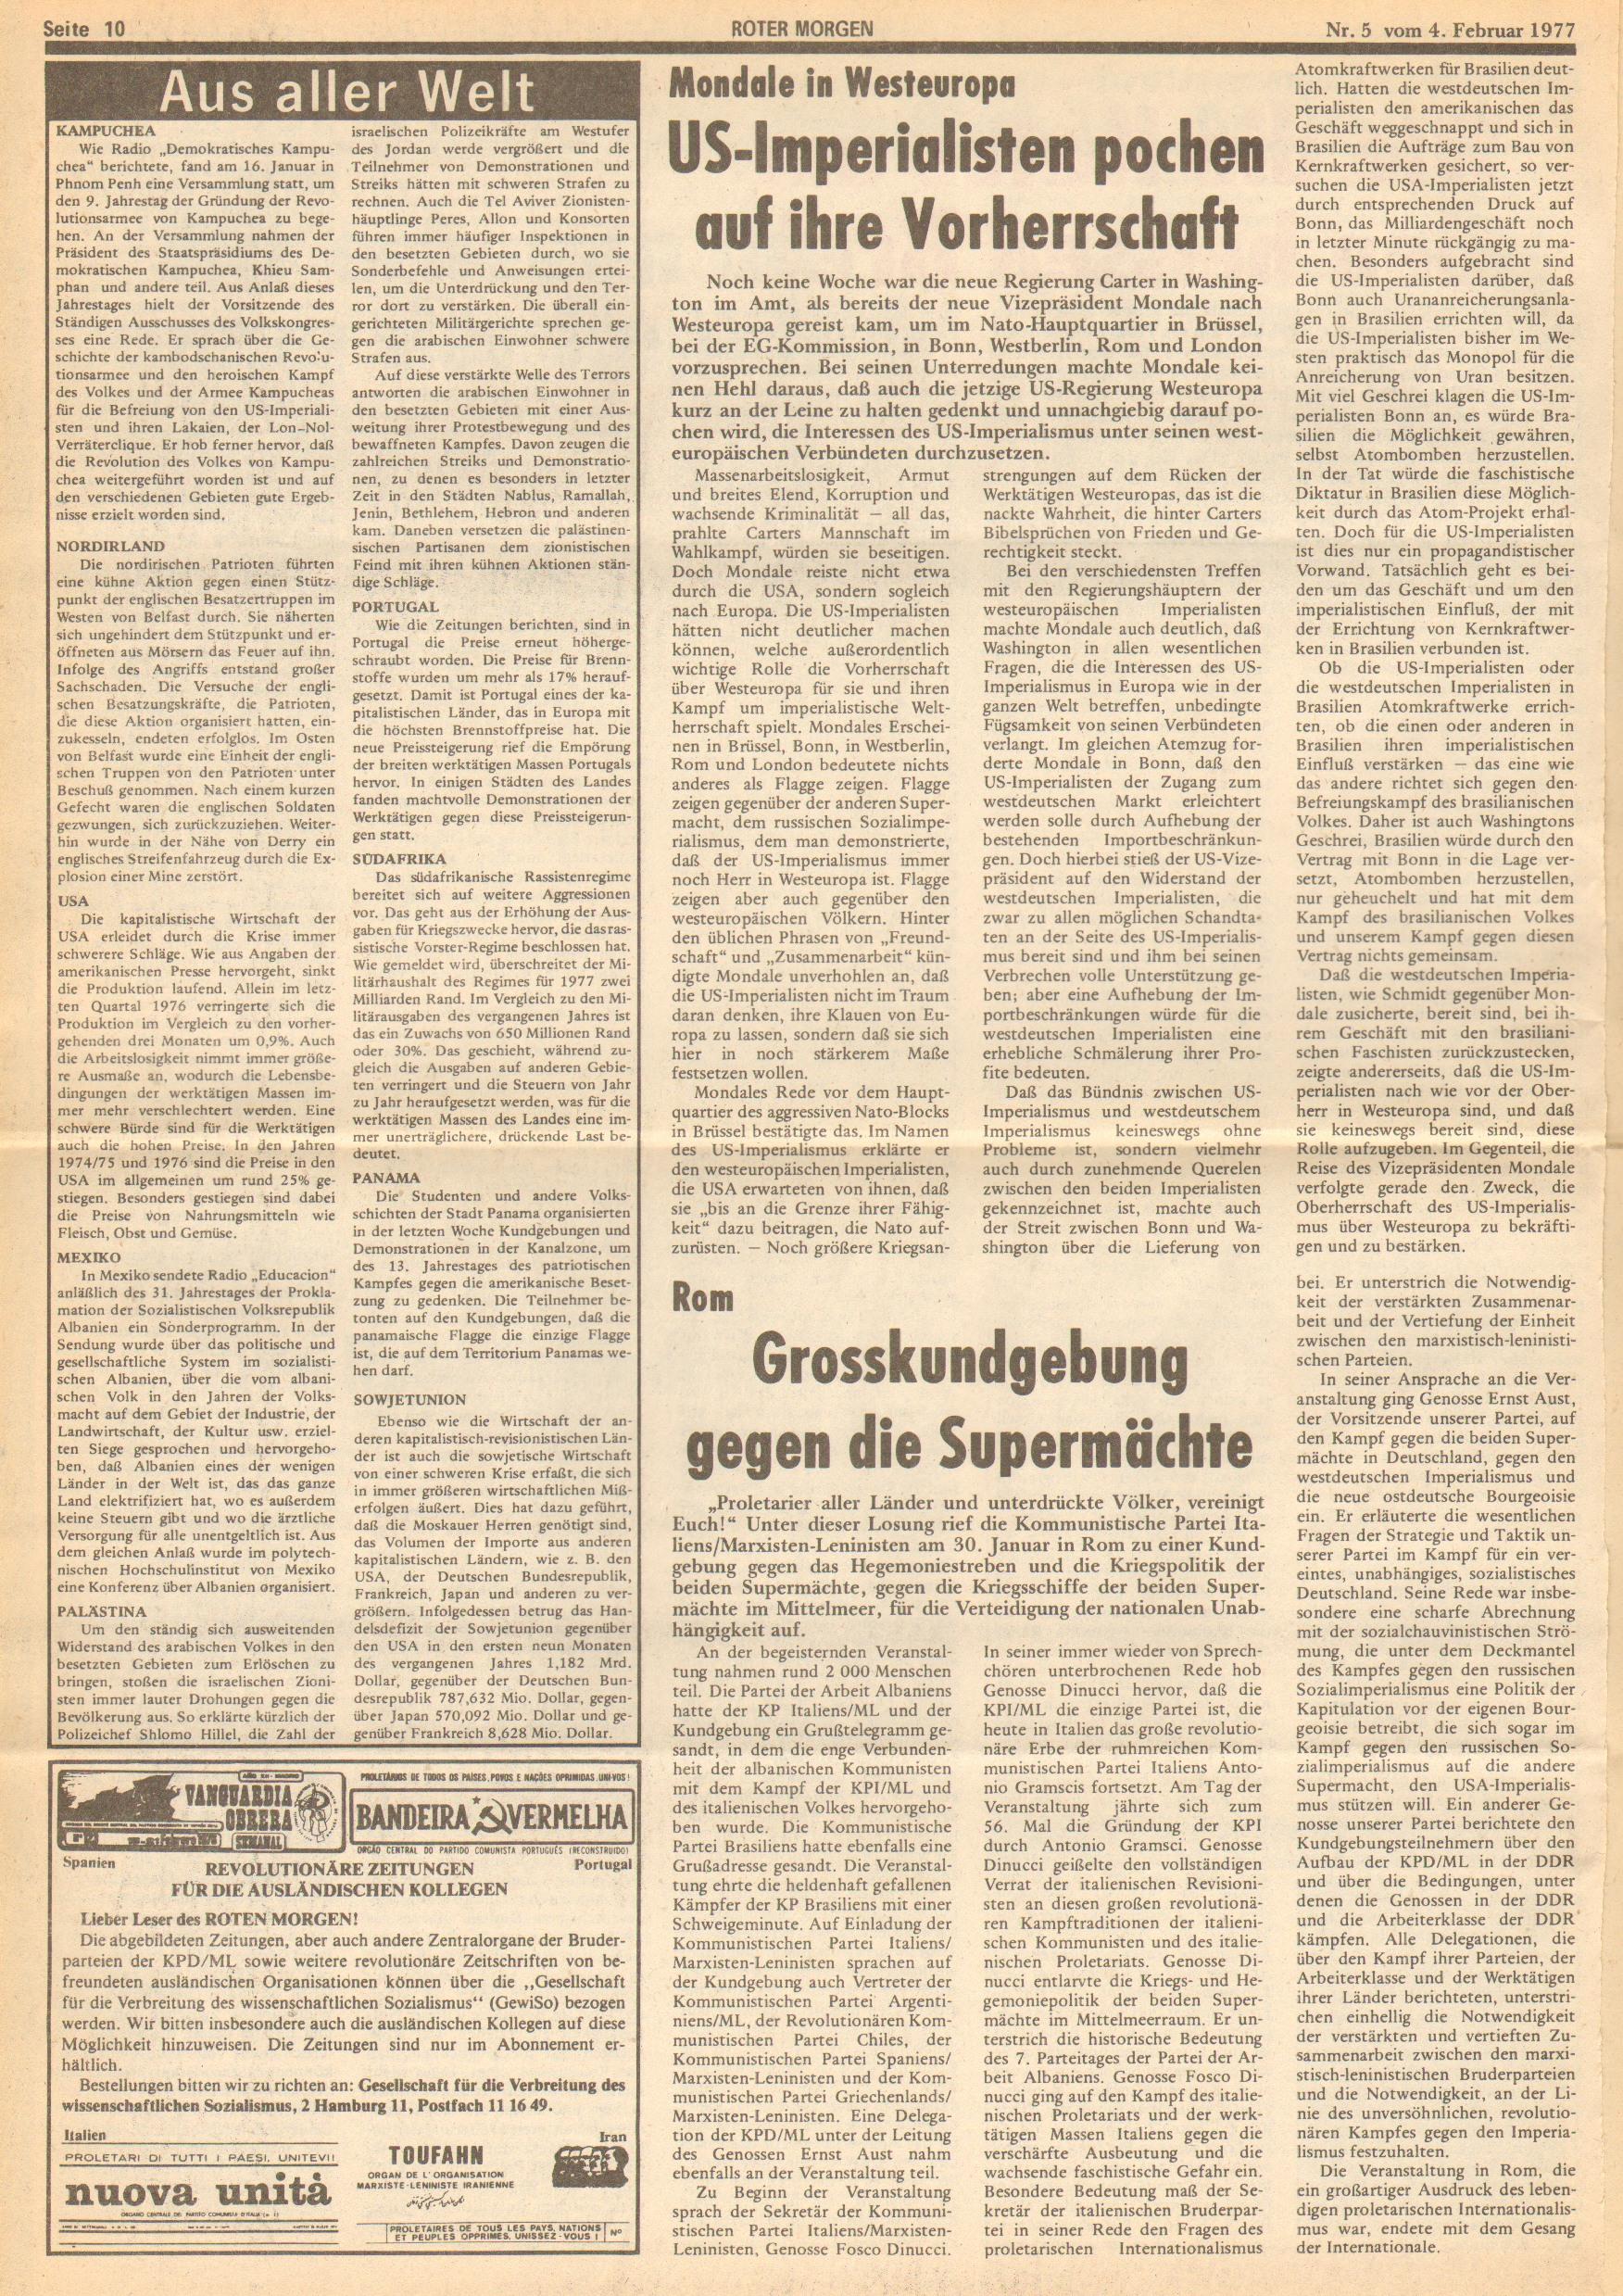 Roter Morgen, 11. Jg., 4. Februar 1977, Nr. 5, Seite 10